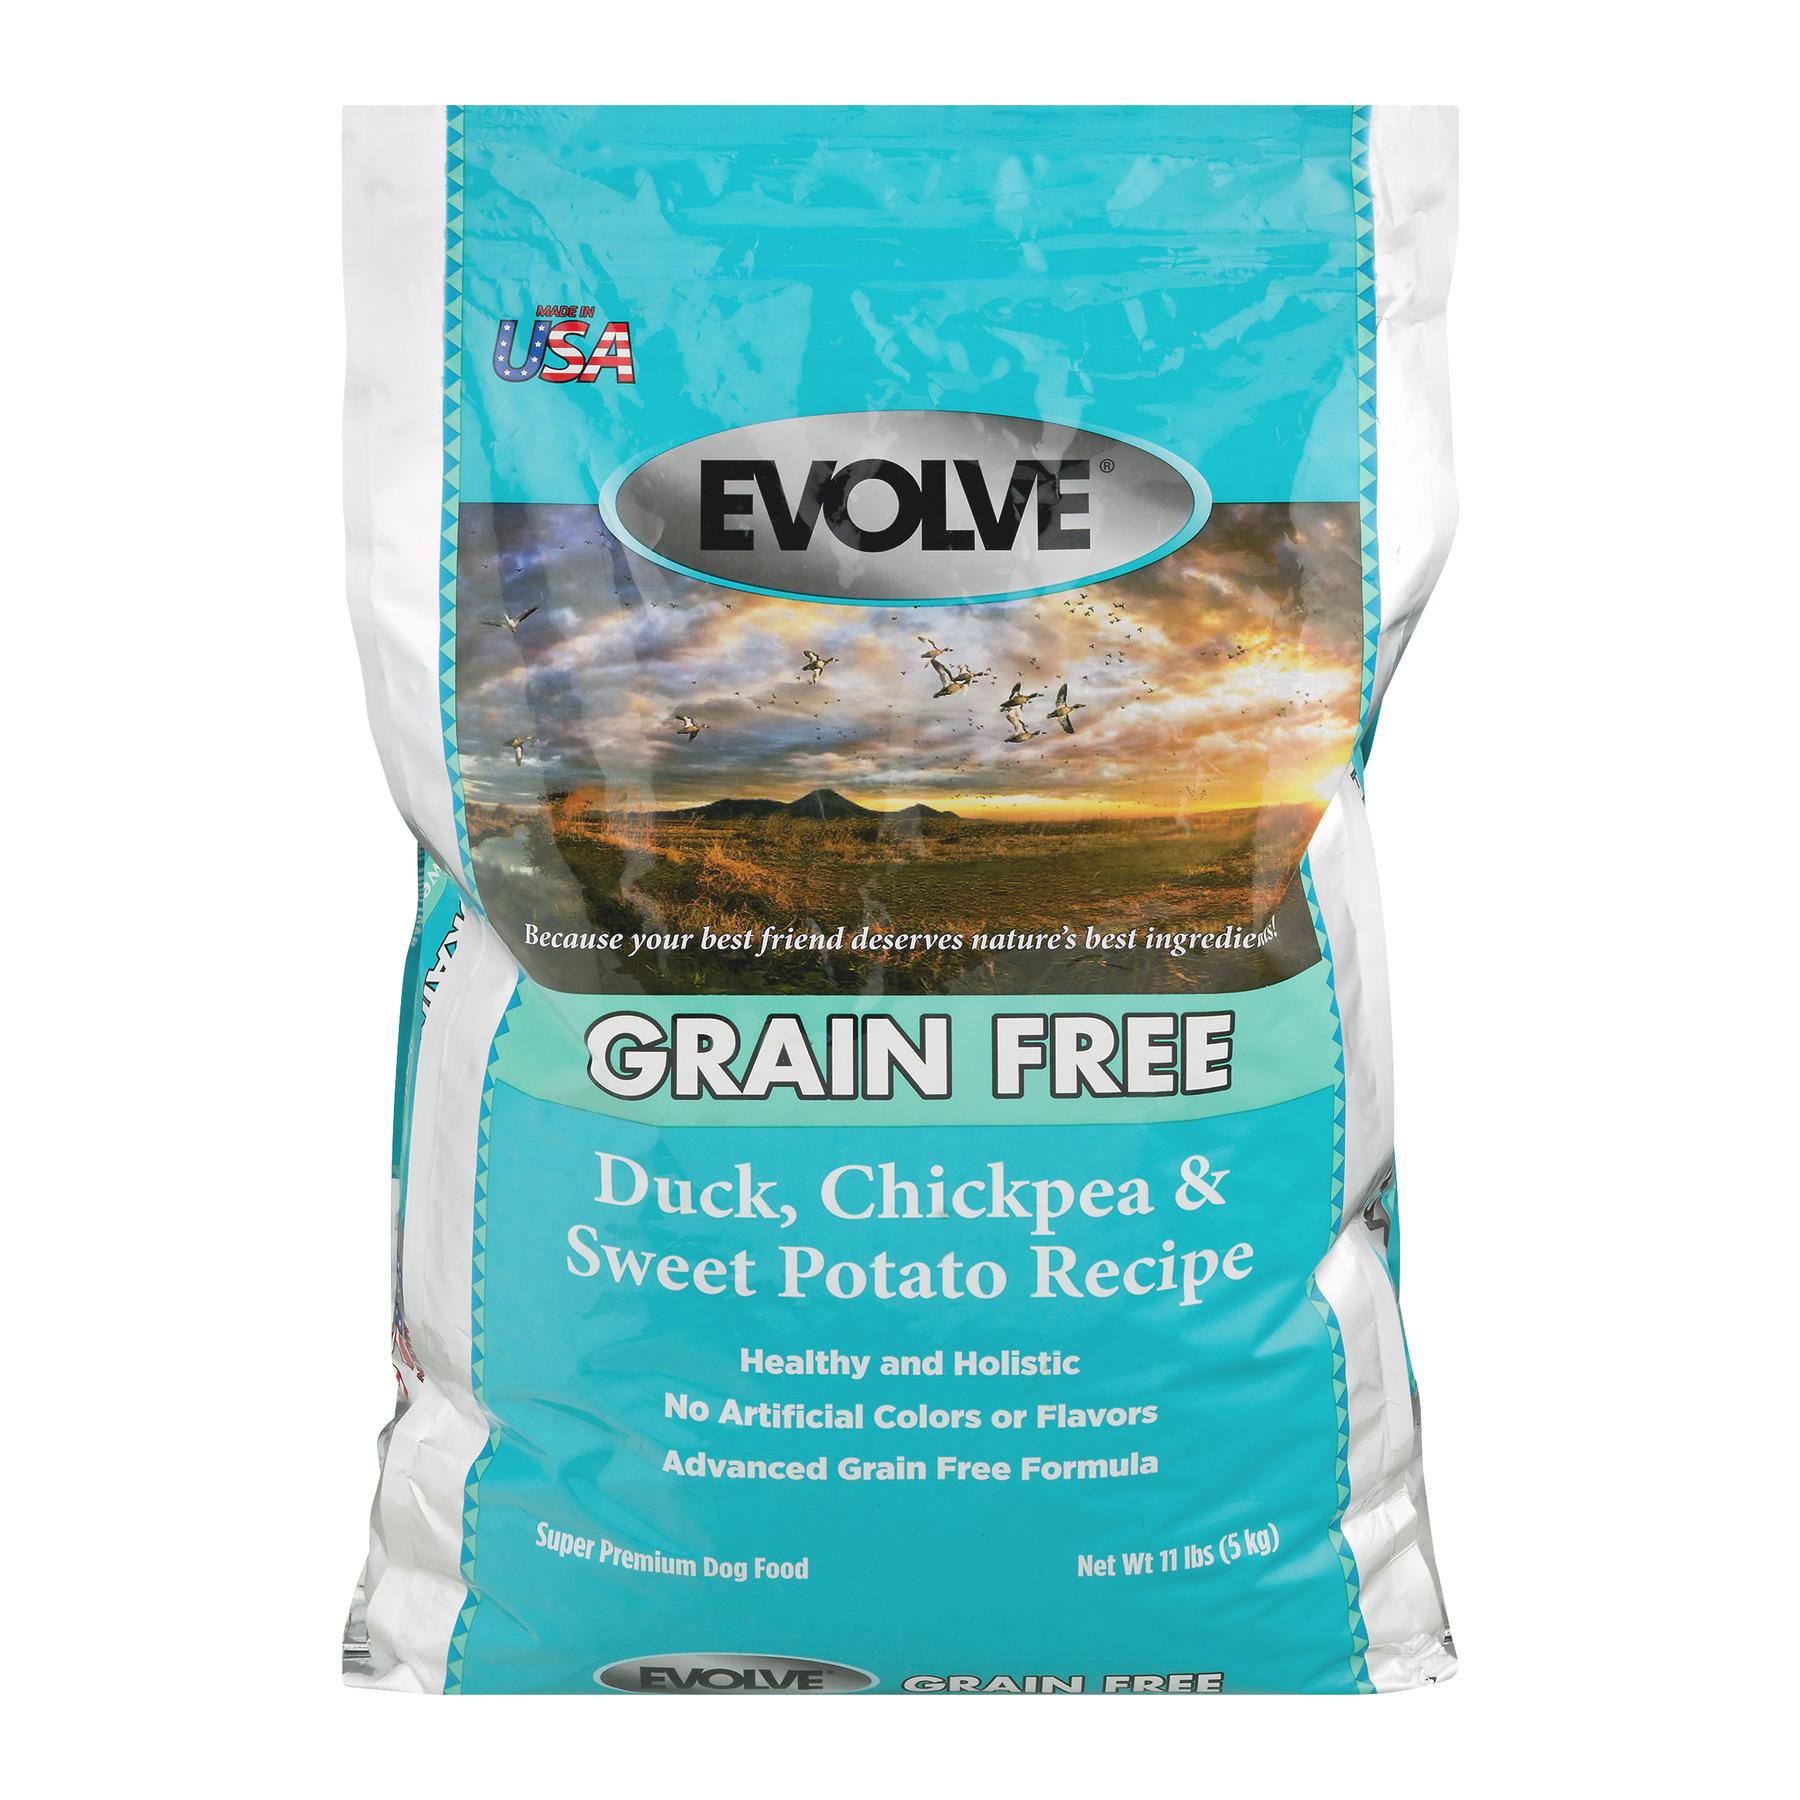 Evolve Grain Free Super Premium Dog Food Duck, Chickpea & Sweet Potato Recipe, 11.0 LB